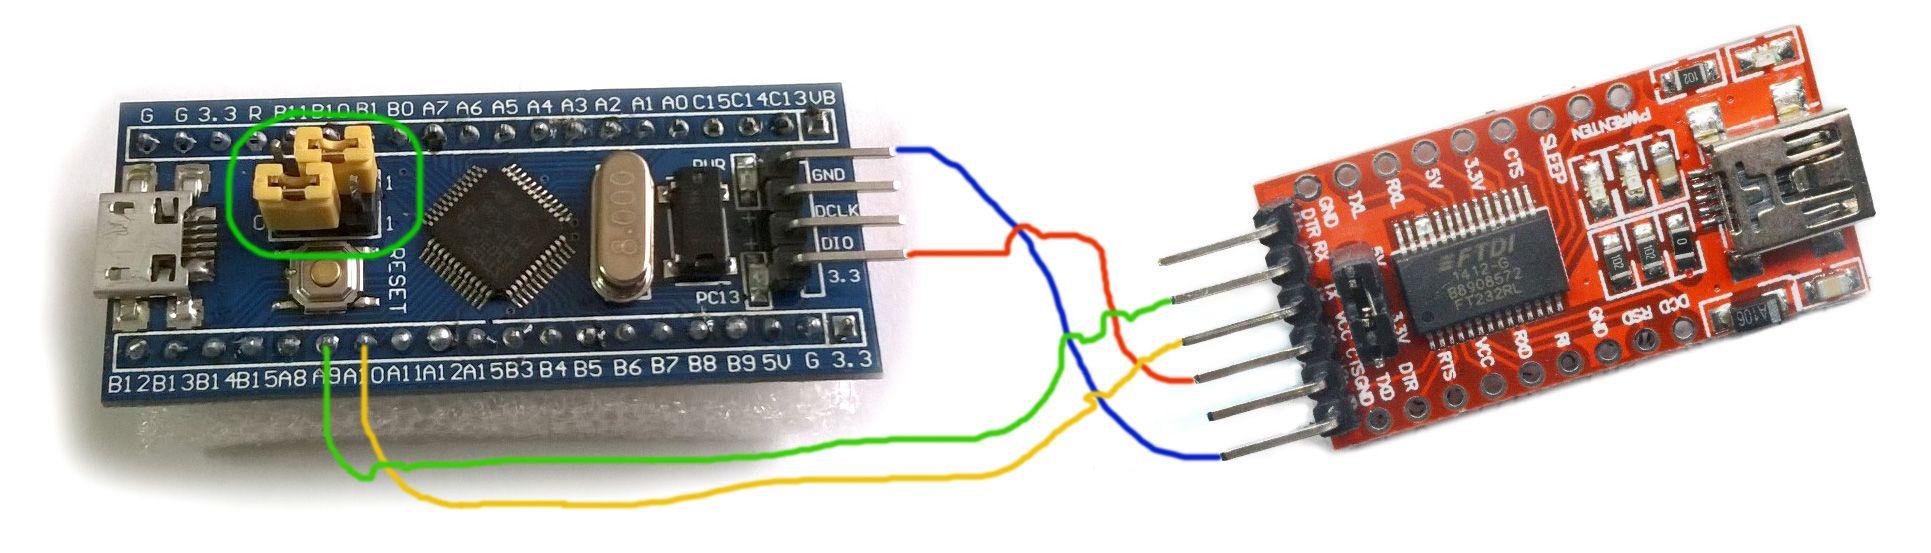 Stm32 Pins Projects To Try In 2018 Pinterest Beaglebone Black Stm32f103c8t6 Arm Minimum System Development Board Module Arduino